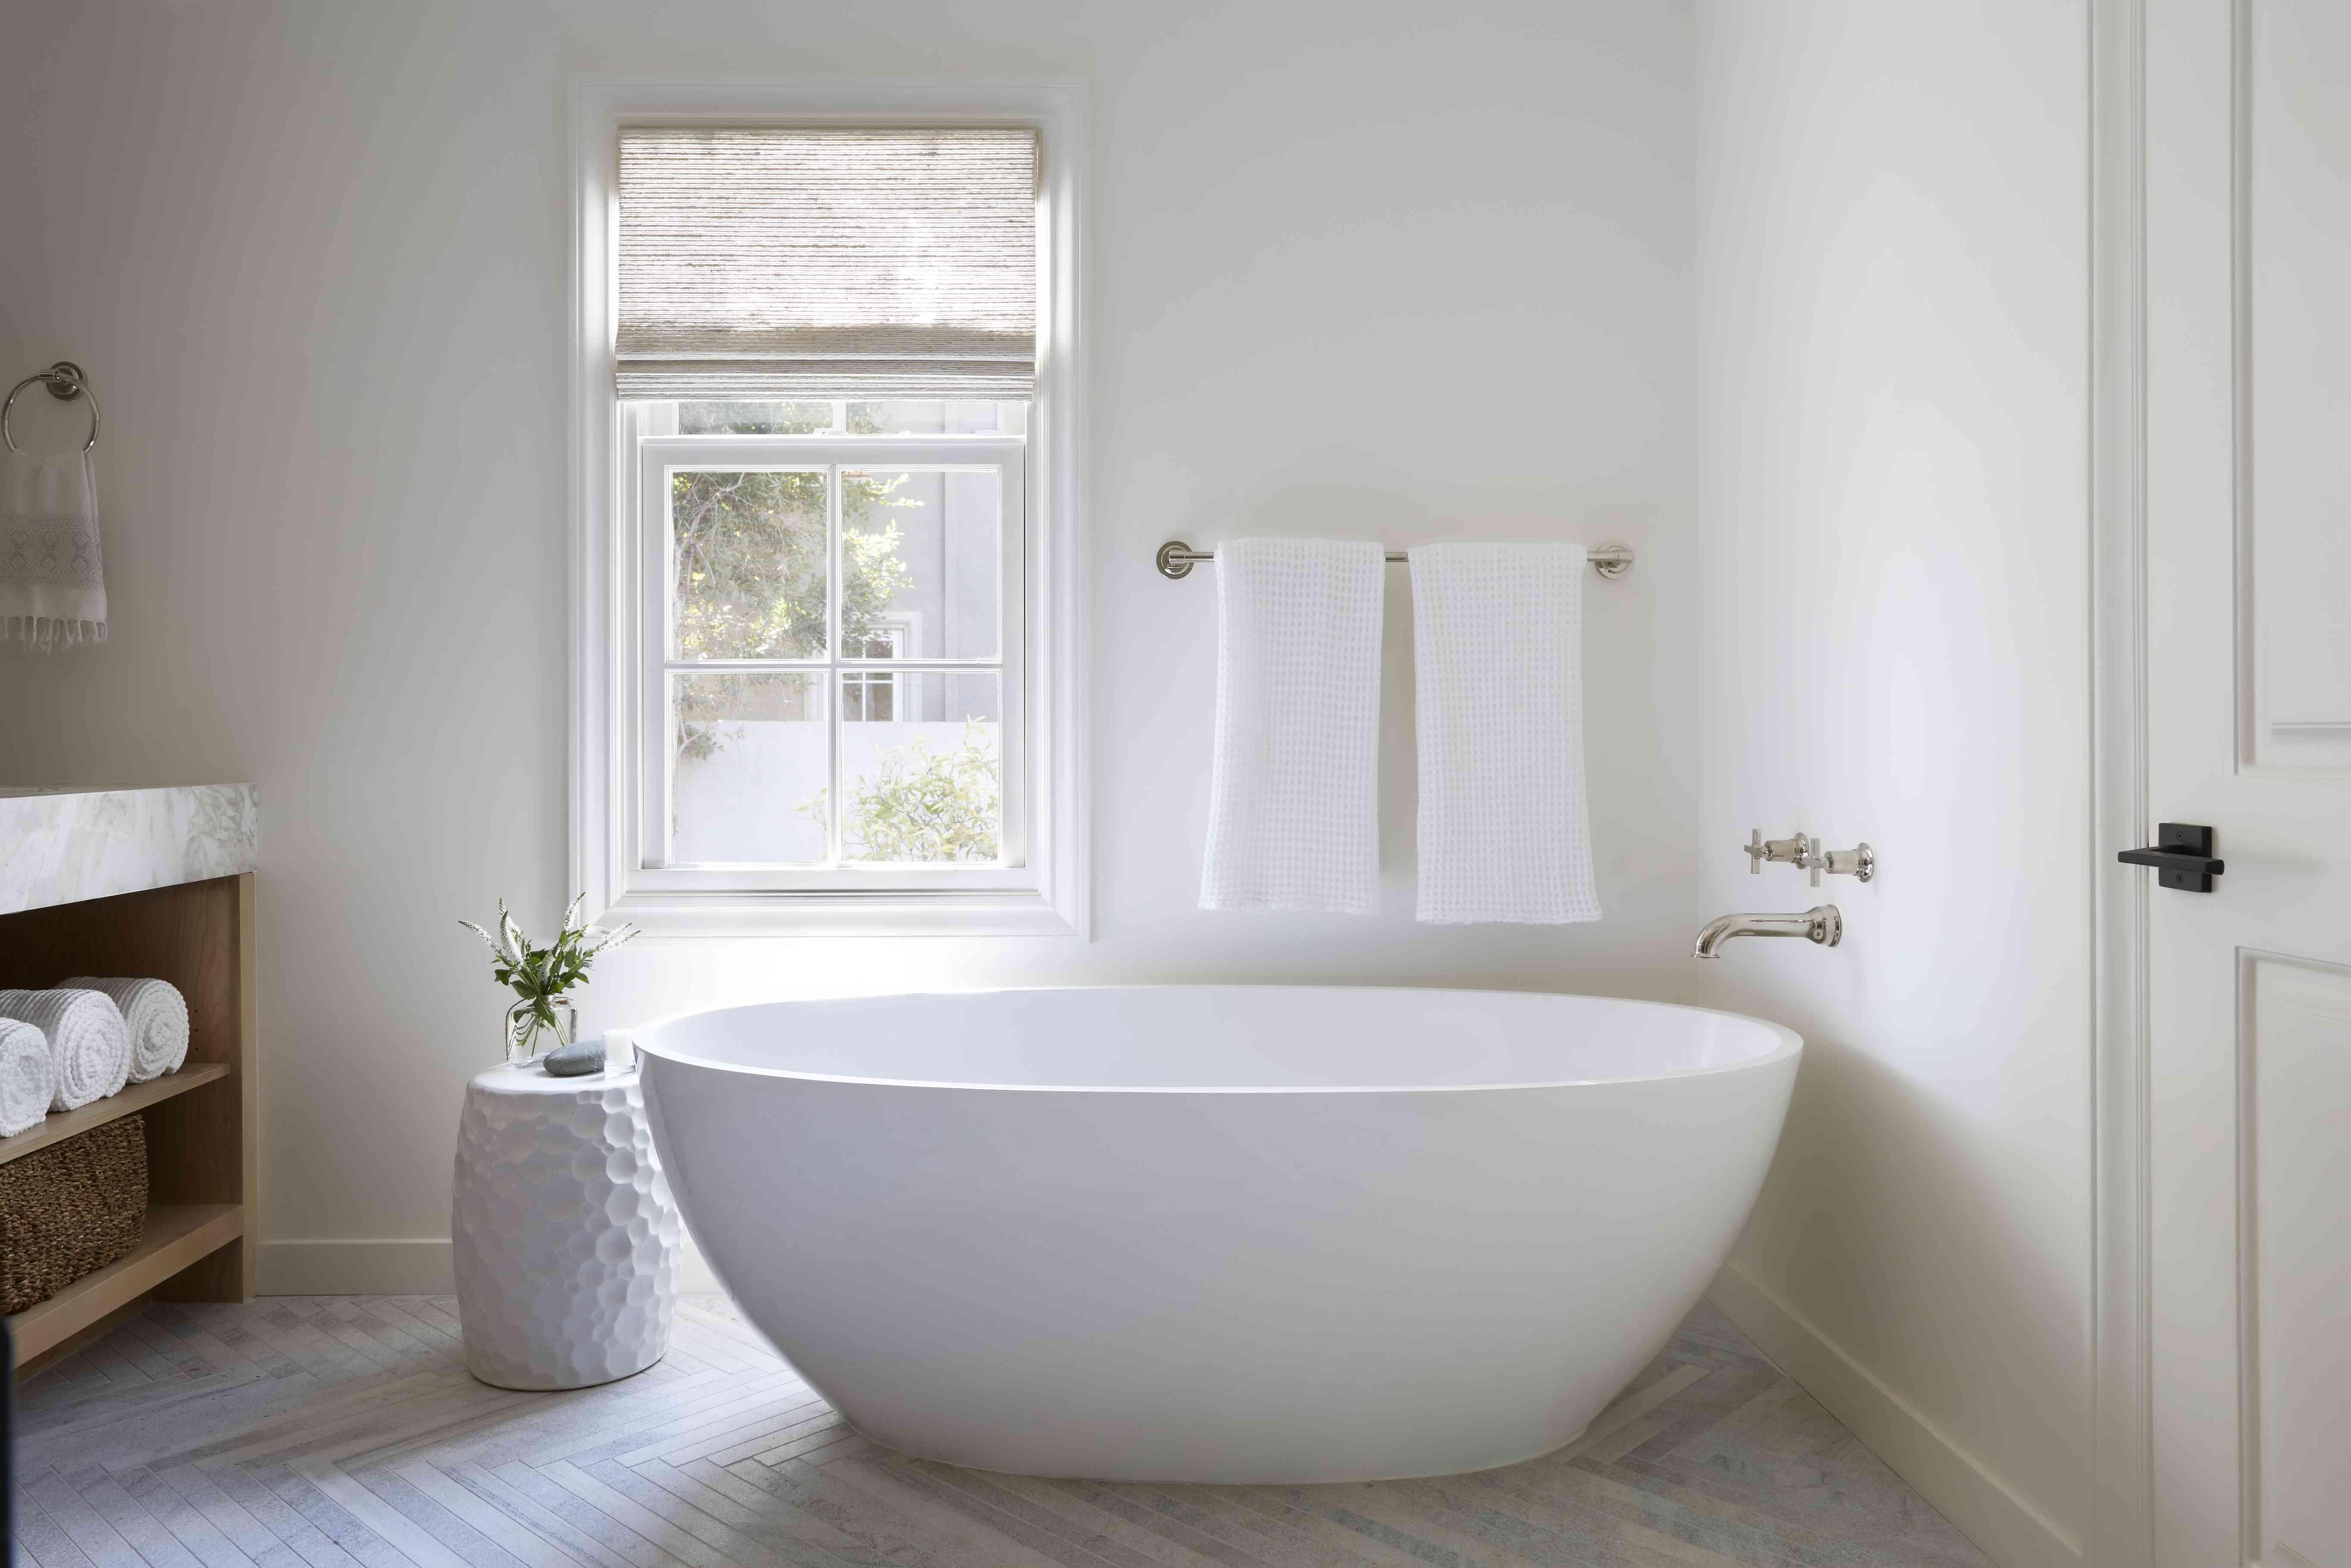 Porcelain freestanding bathtub under a widow.